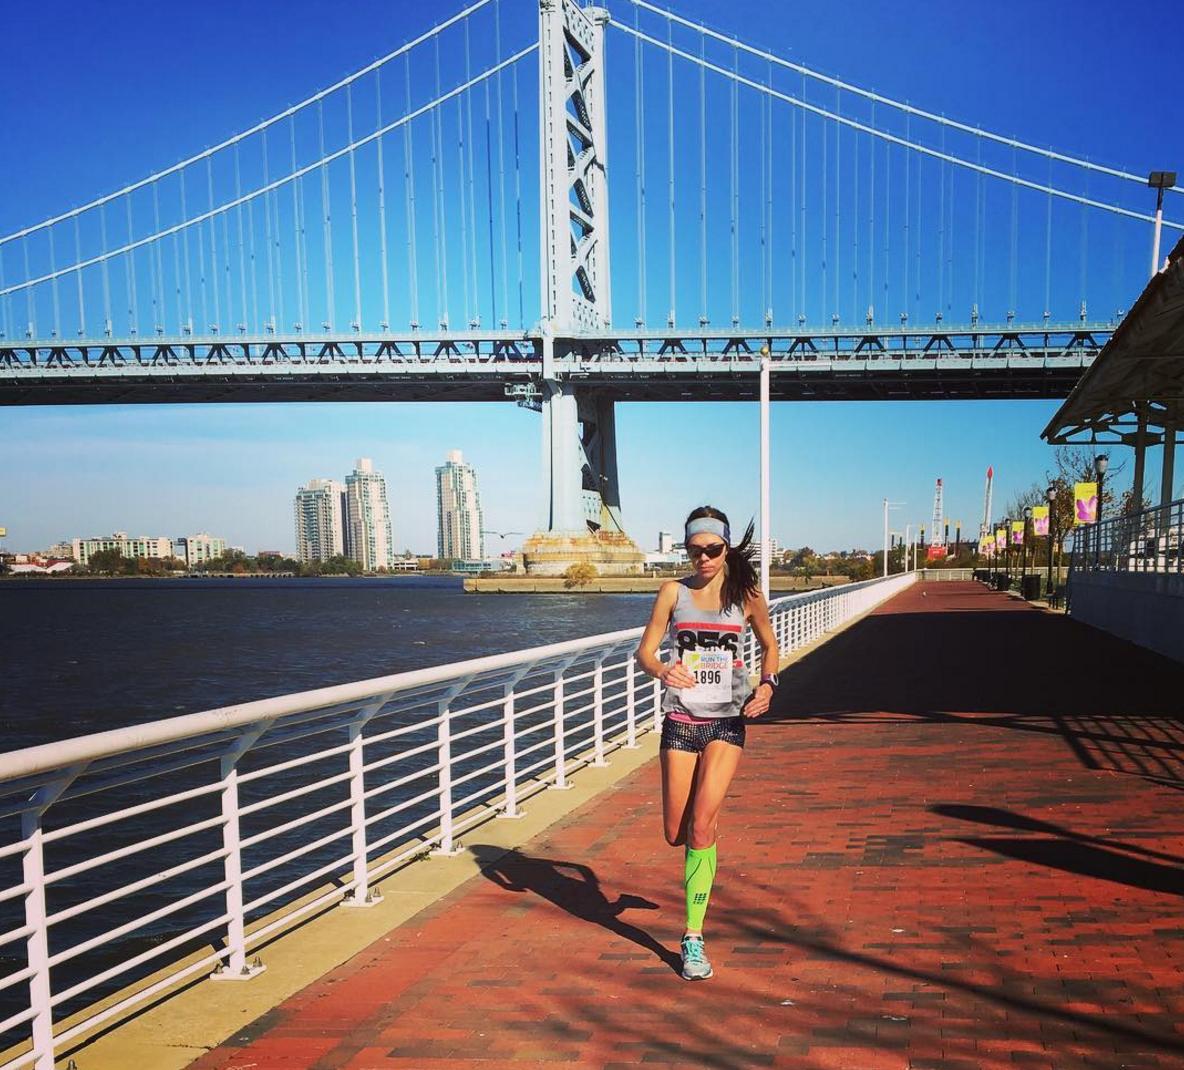 Run the Bridge 10k(38:58)